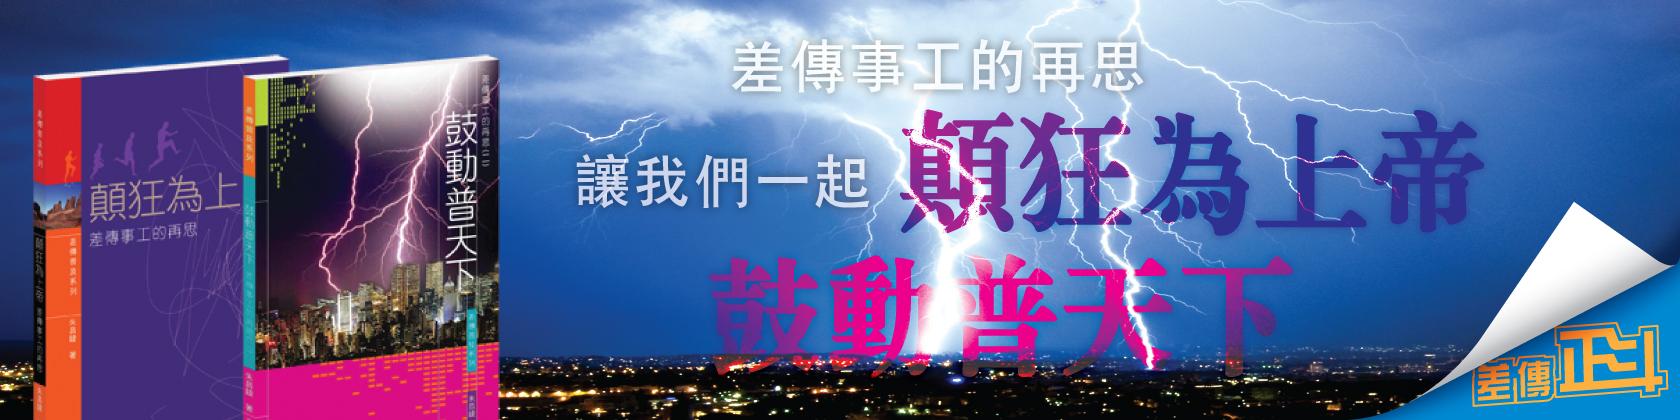 CB-01-web-banner-1680-x-420-B1-05